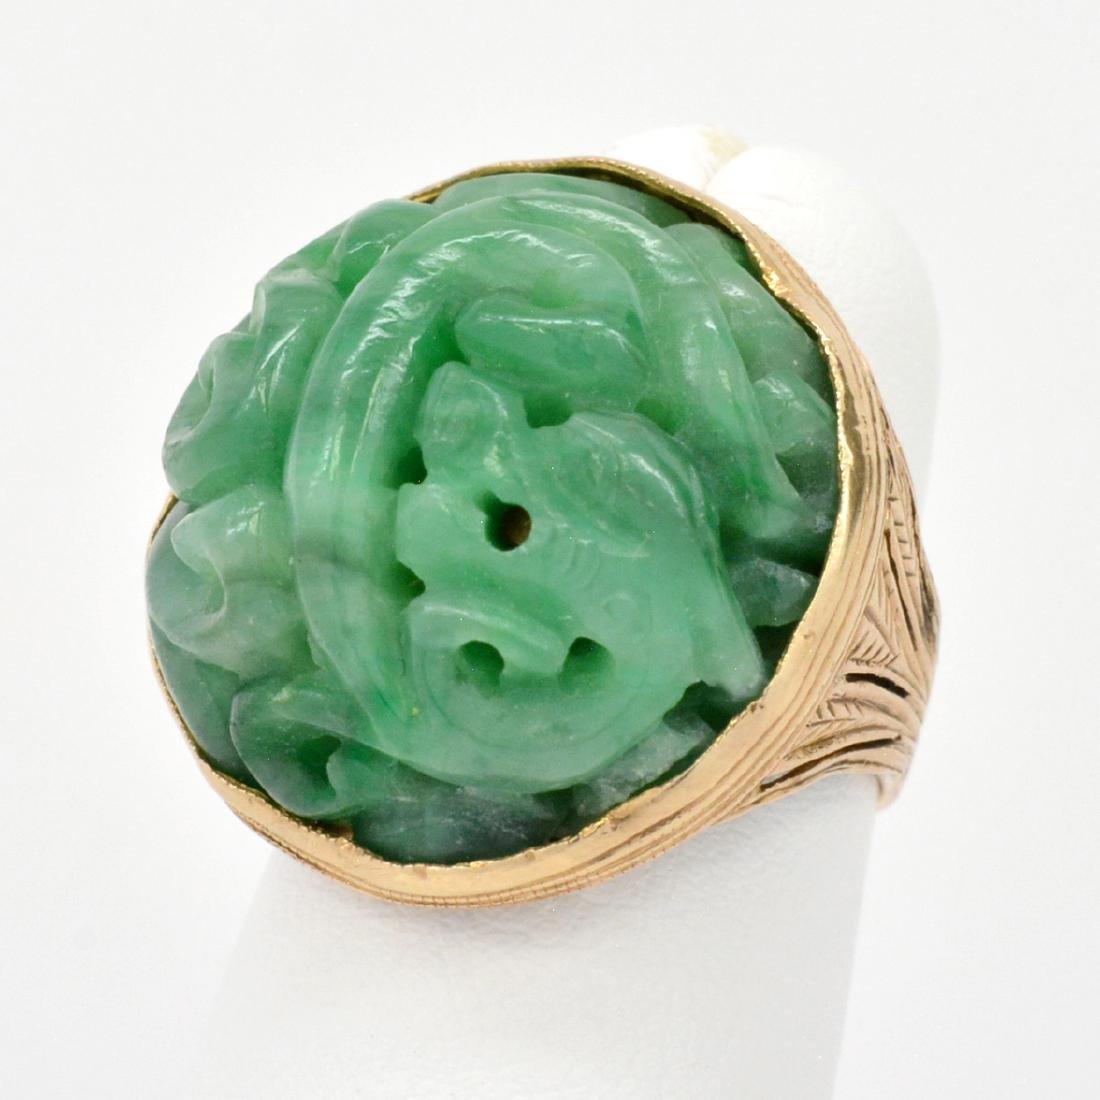 14K Gold Carved & Pierced Dragon Jade Ring - 2